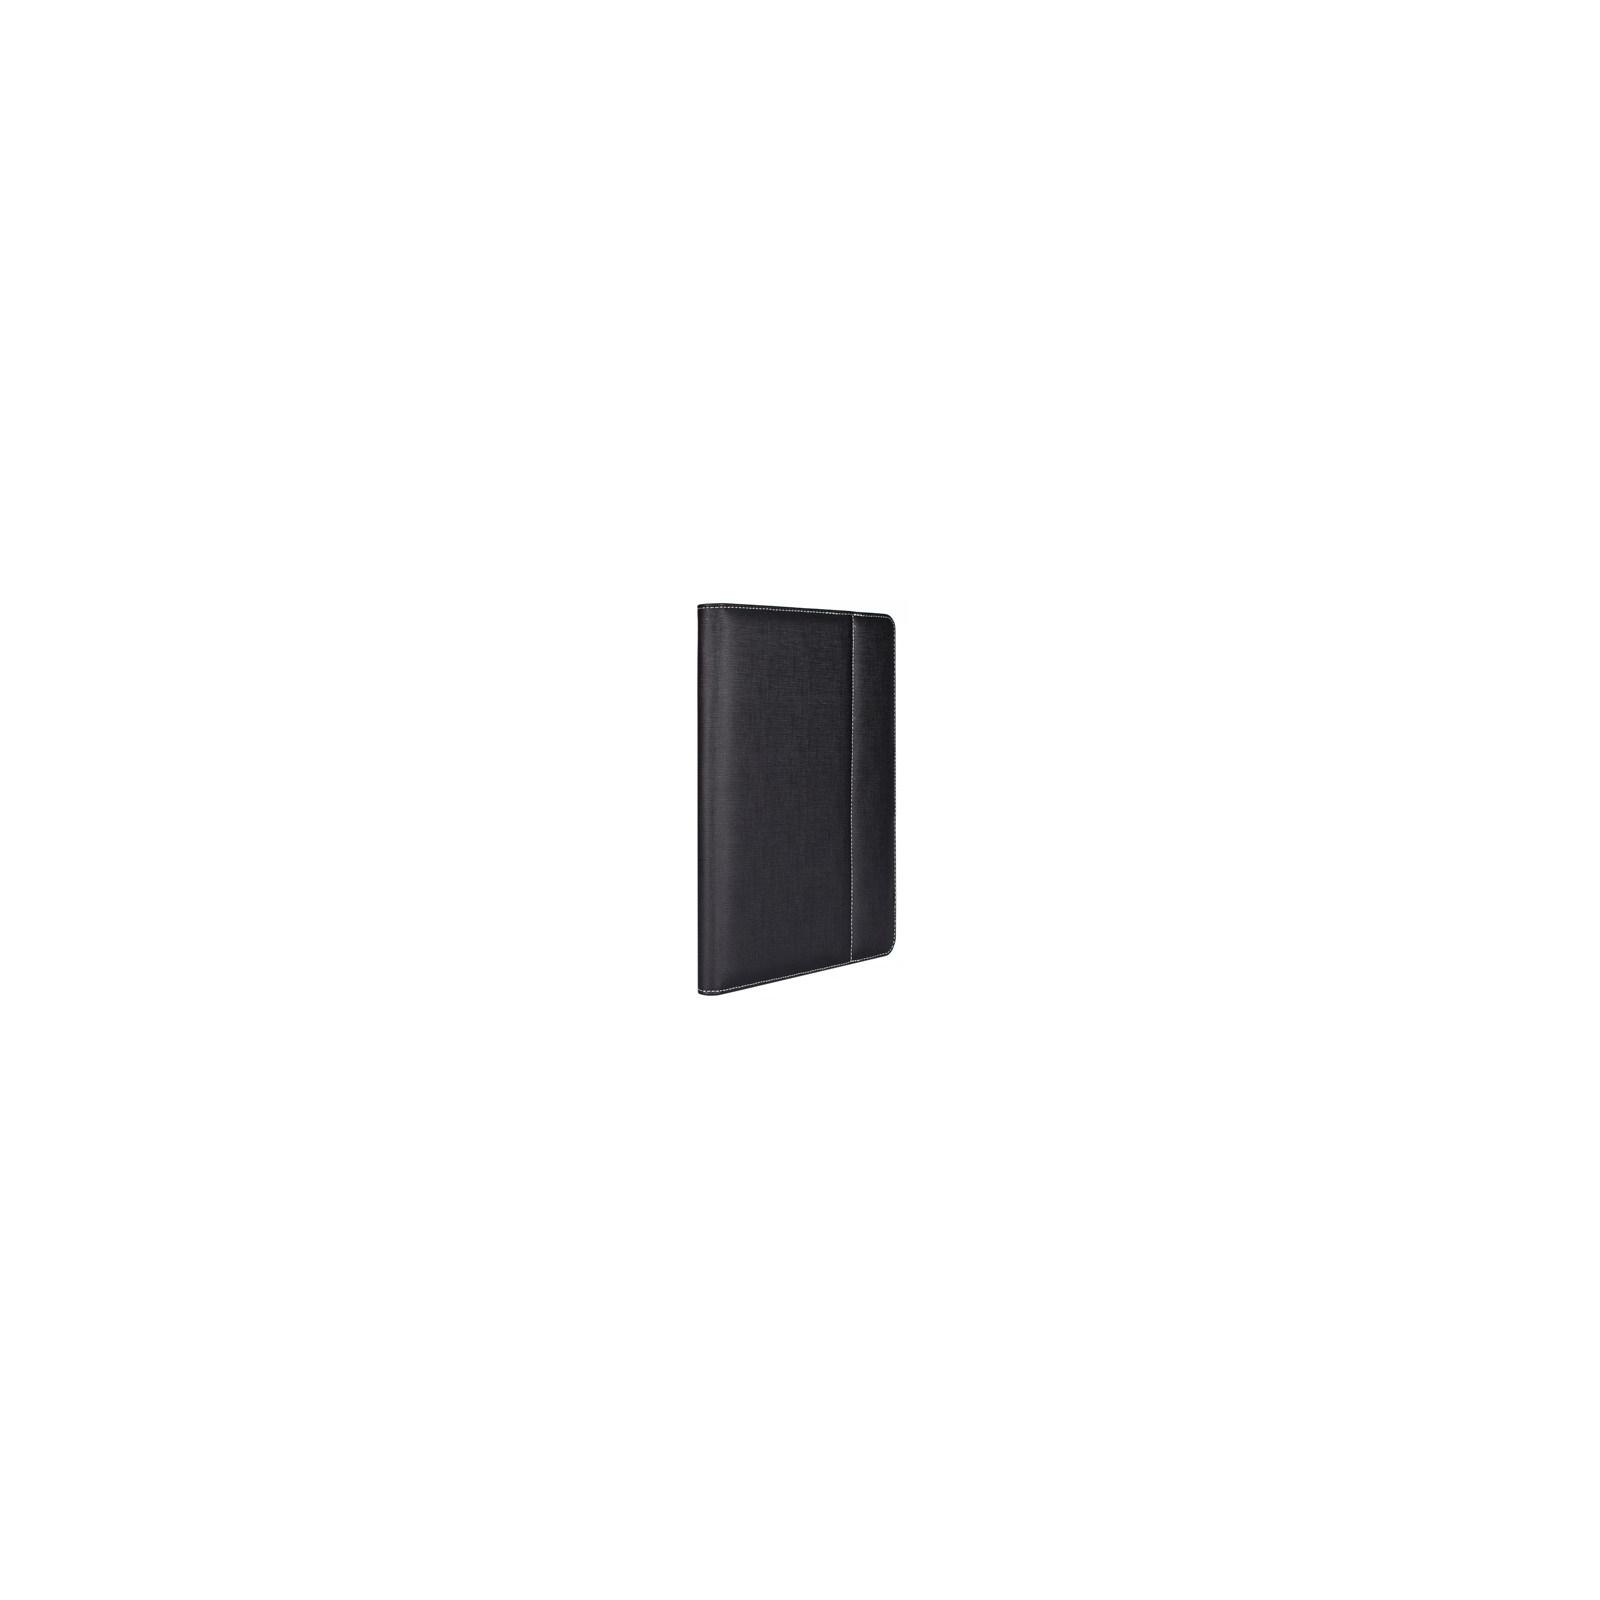 "Чехол для планшета Lex 10"" Universal (Black) (LXTC-4010BK)"